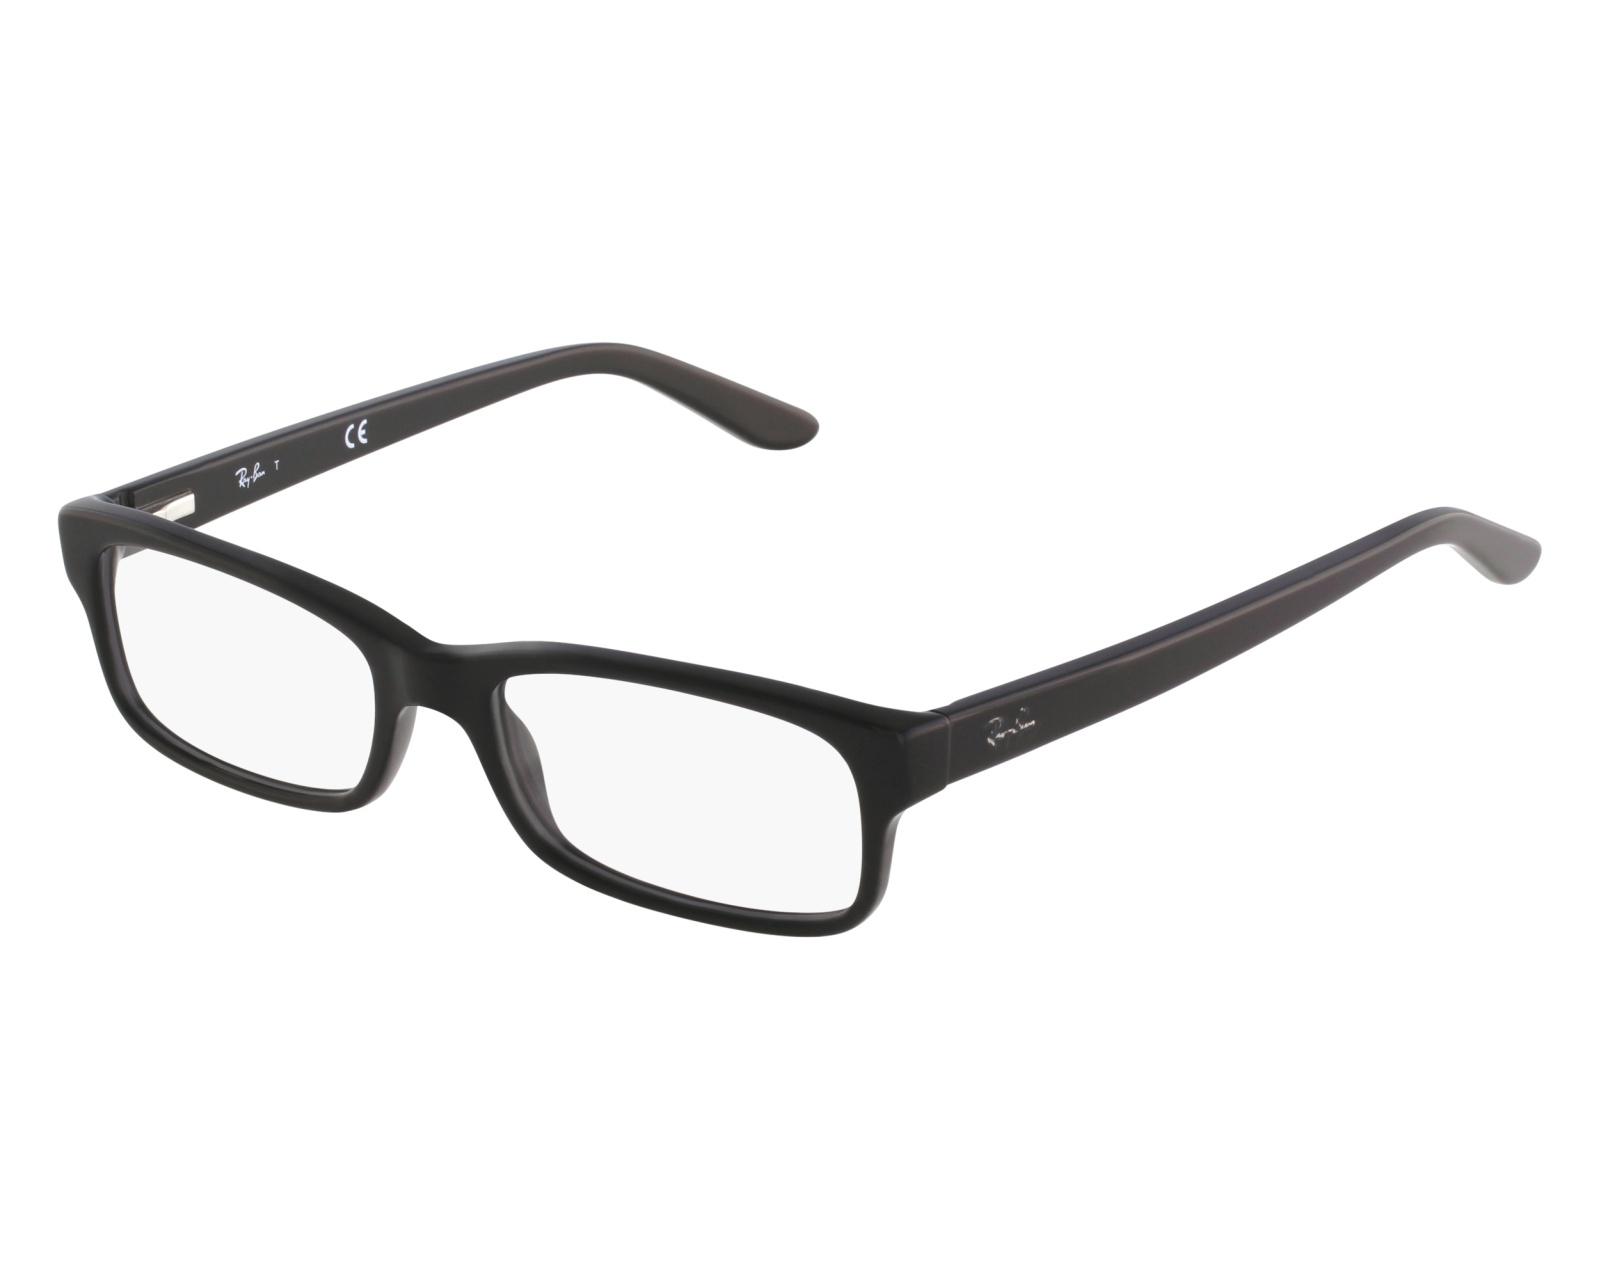 b50a563bf39c RAY BAN   Brille Brillengestell RX5187 2000 NEU